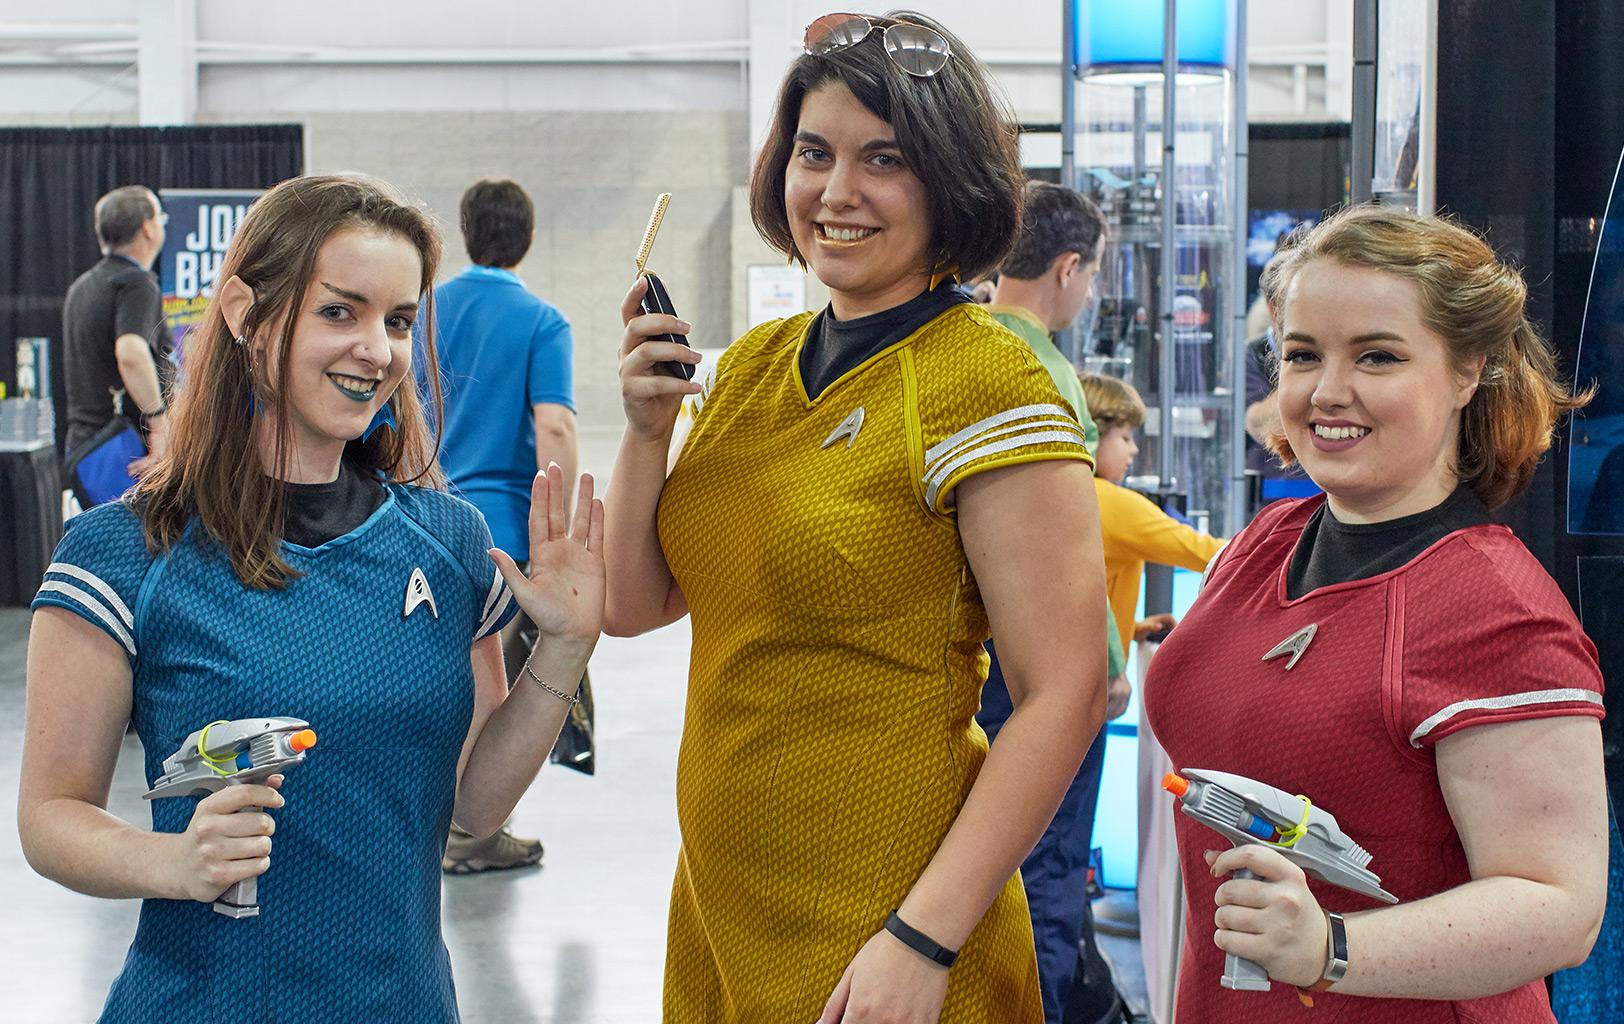 What Makes a 'Star Trek' Fan? Costumed Trekkies Share Stories (Slideshow)